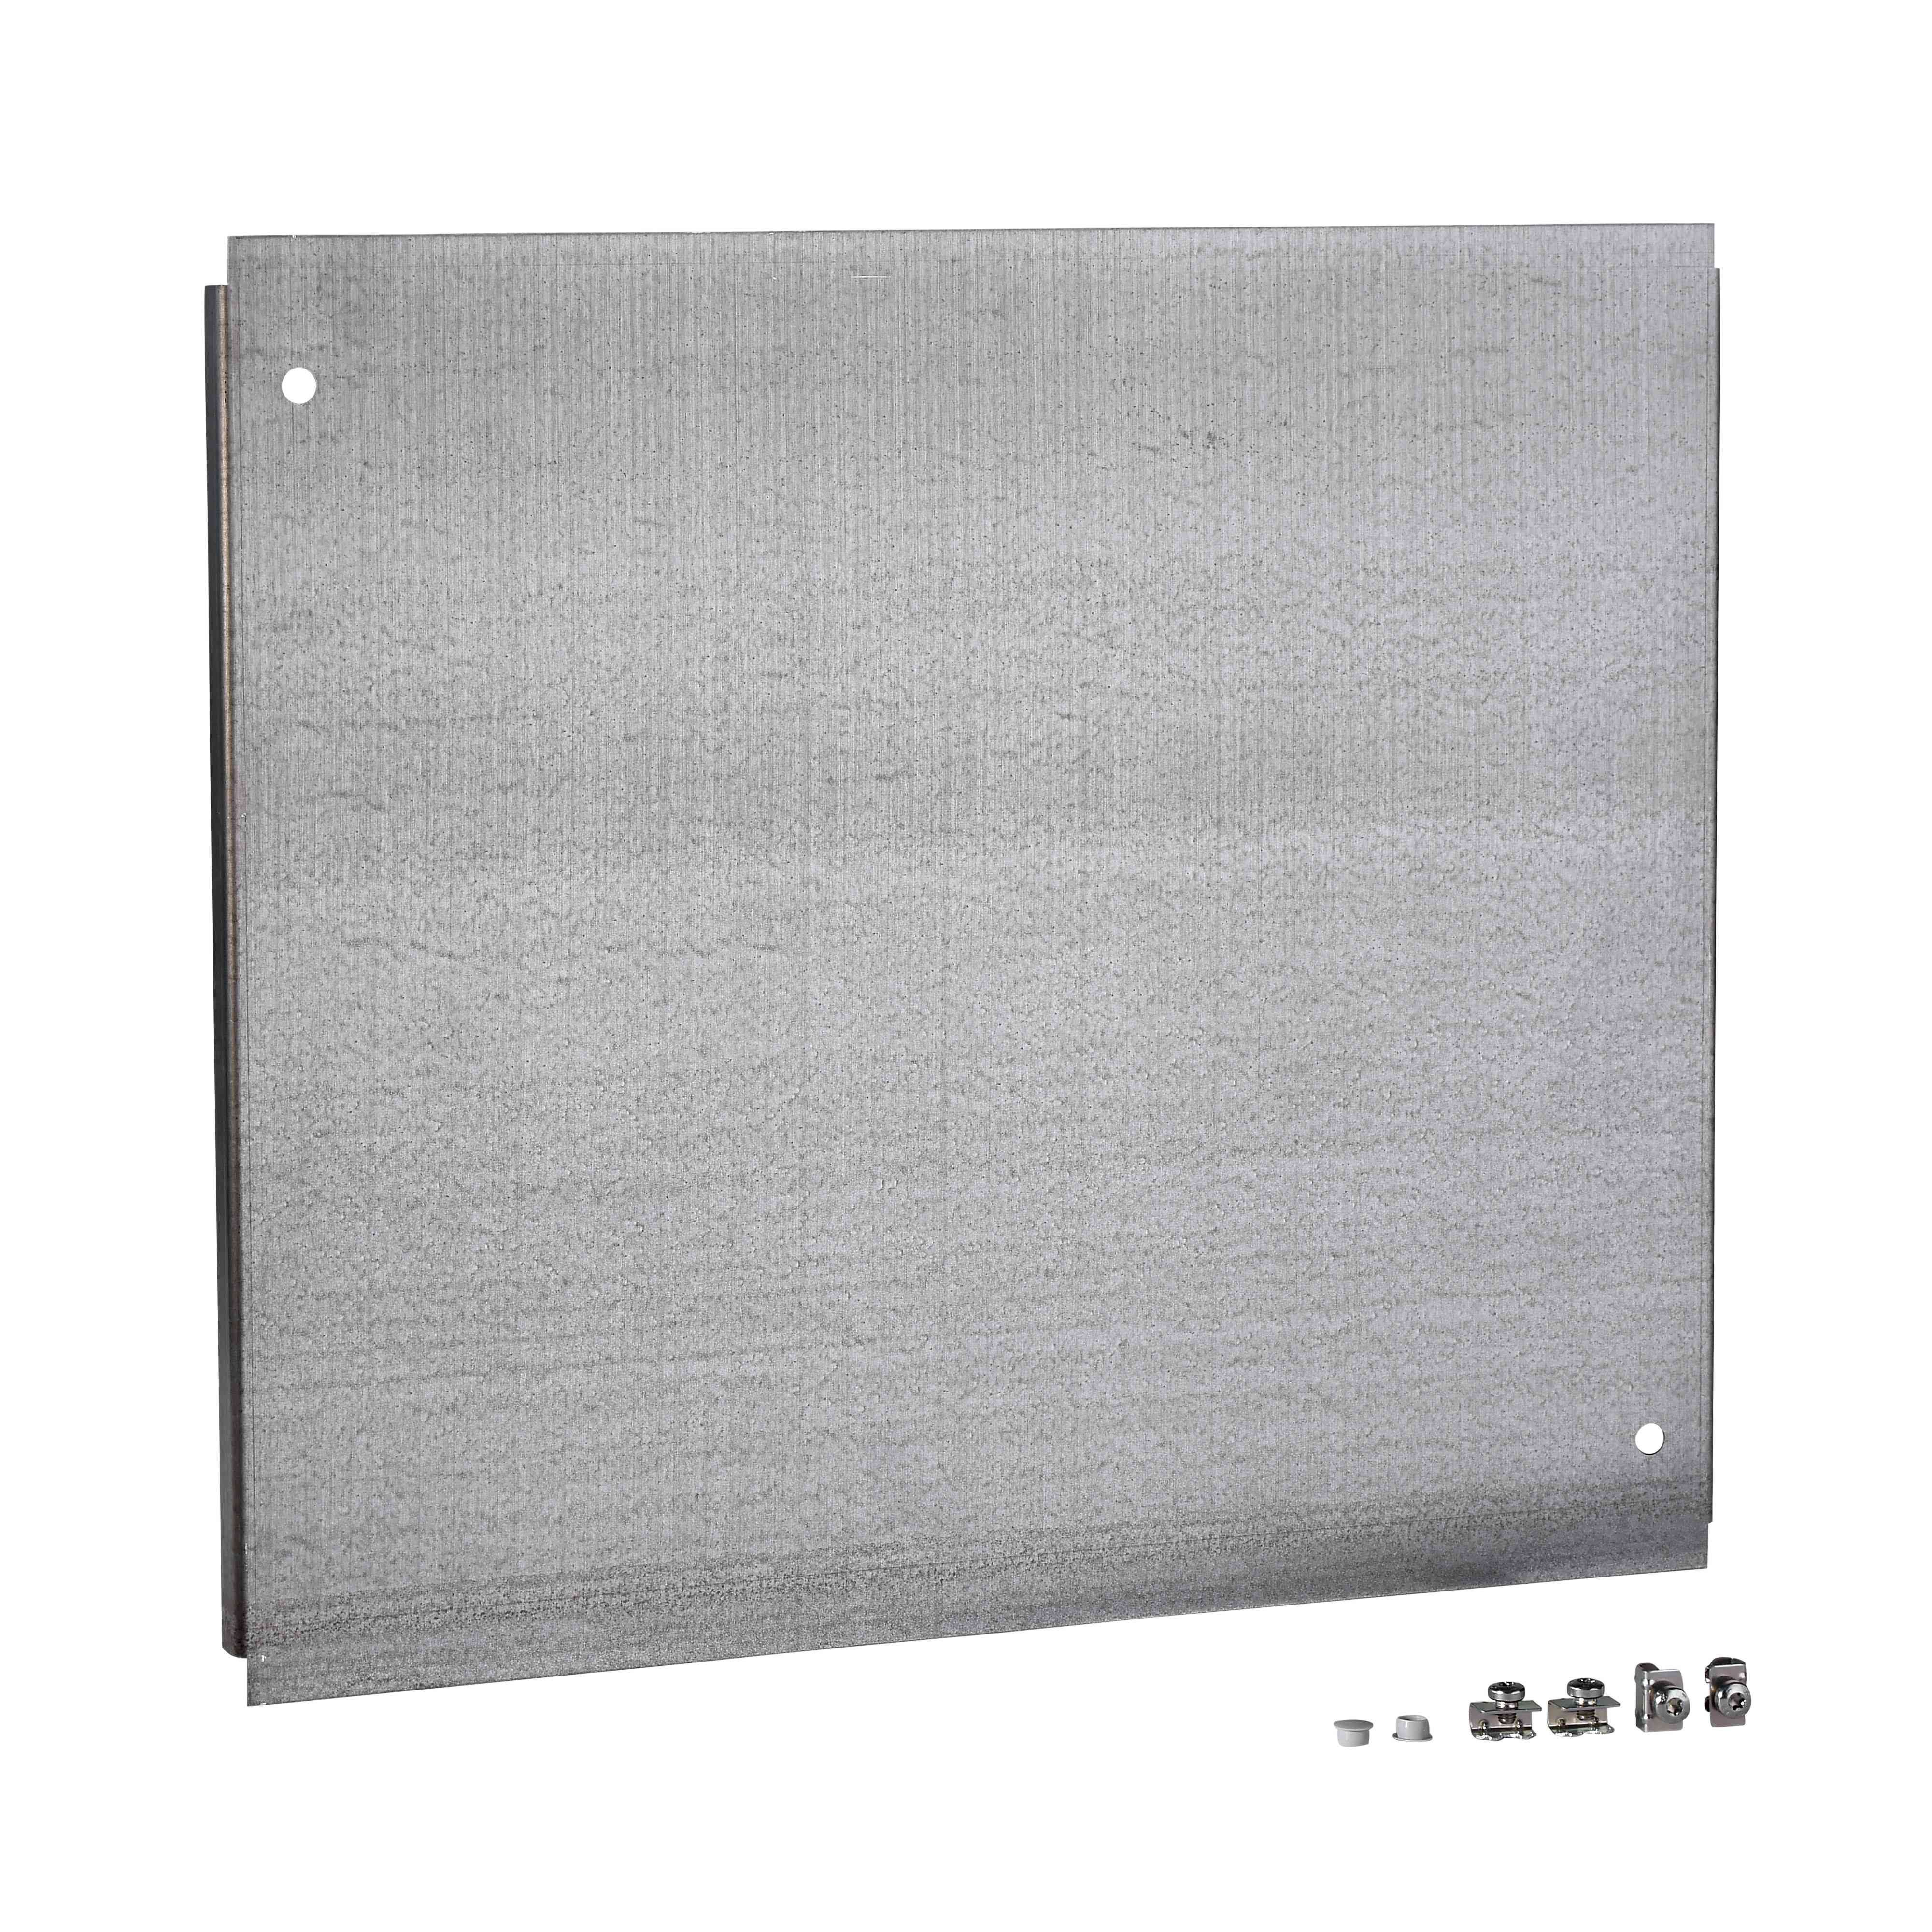 Spacial SF navadna plošča kab. uvodnice - pritr. s sponkami - 800 x 1000 mm